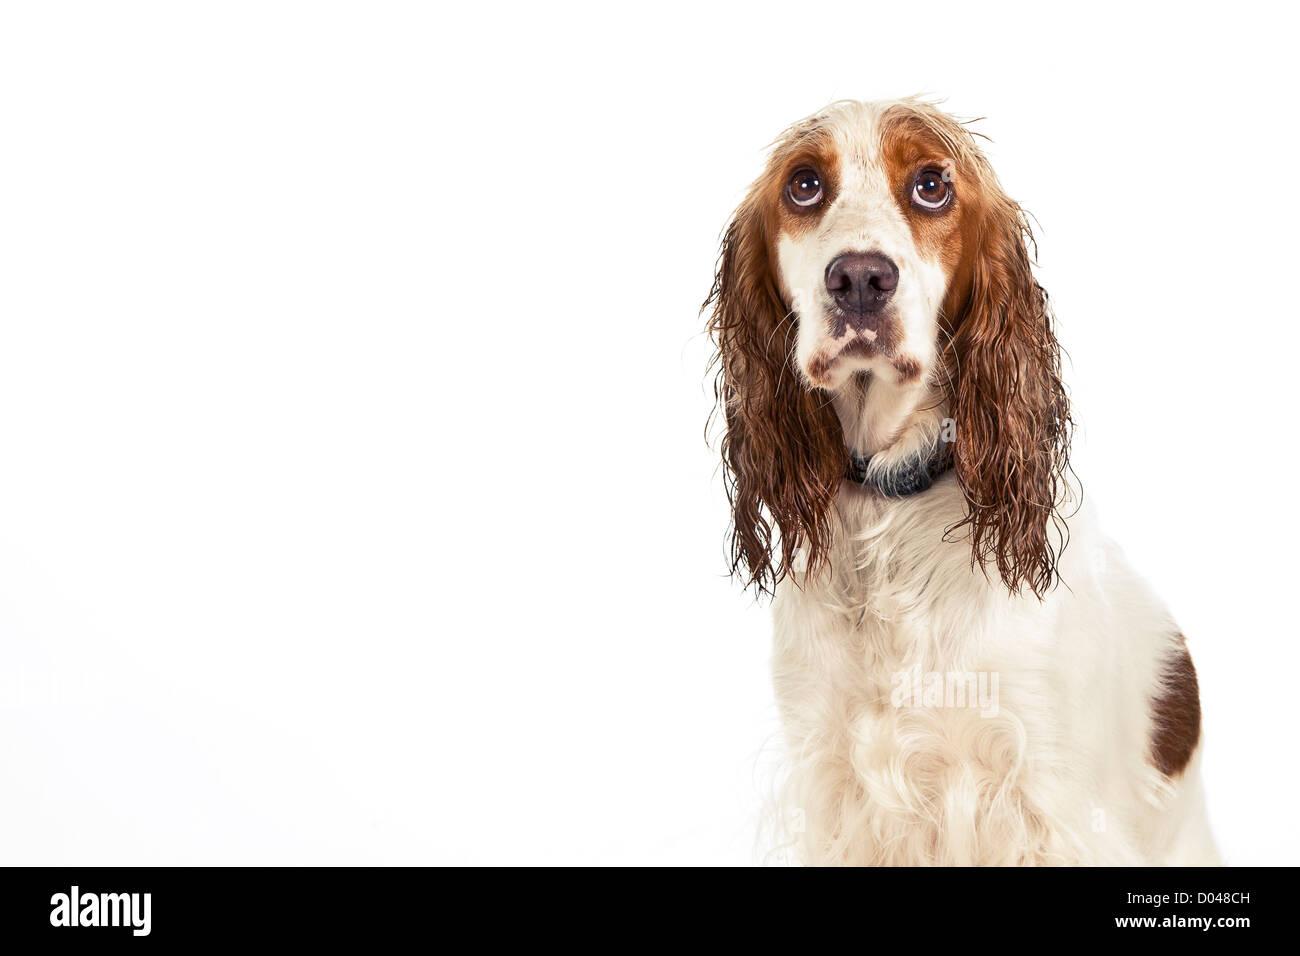 a sad dog on a white background - Stock Image